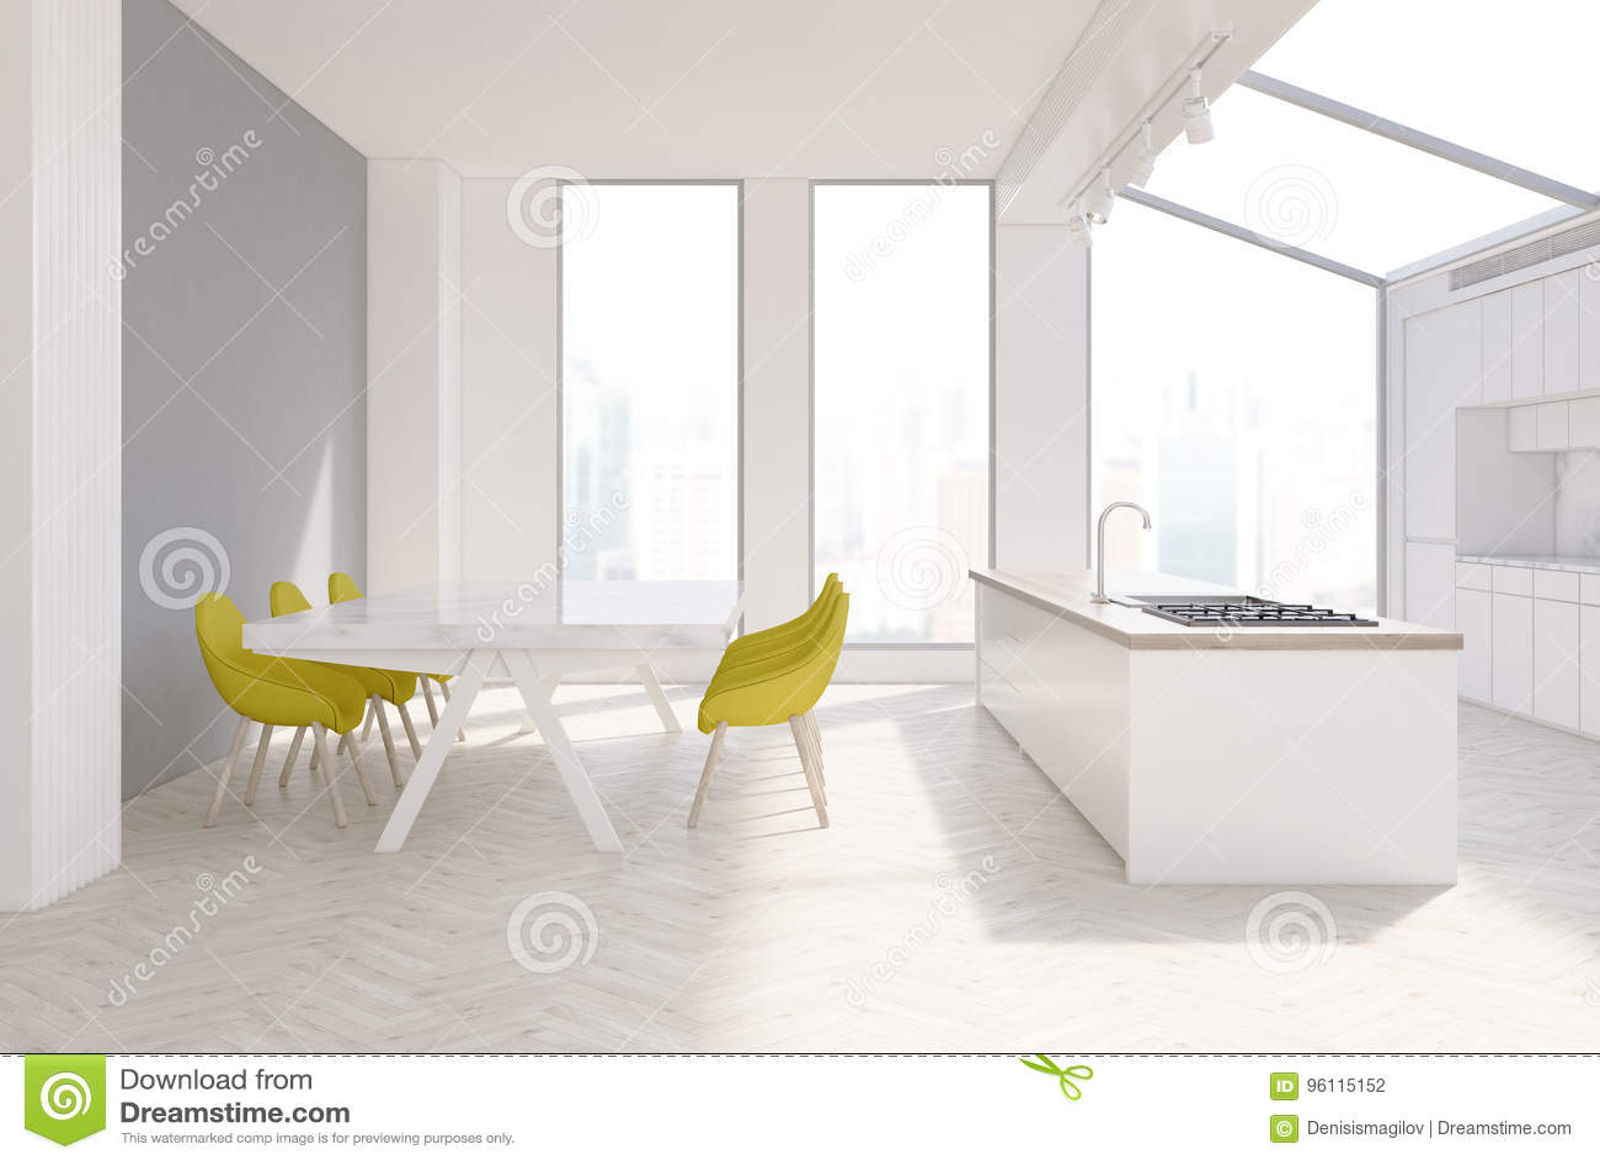 gray kitchen chairs cobalt blue accessories 内部灰色的厨房 黄色椅子库存例证 插画包括有龙头 实际 翻译 回报 与狭窄的高窗口 一张长的大理石桌 黄色椅子两行和一个木工作台面的灰色厨房内部3d翻译嘲笑